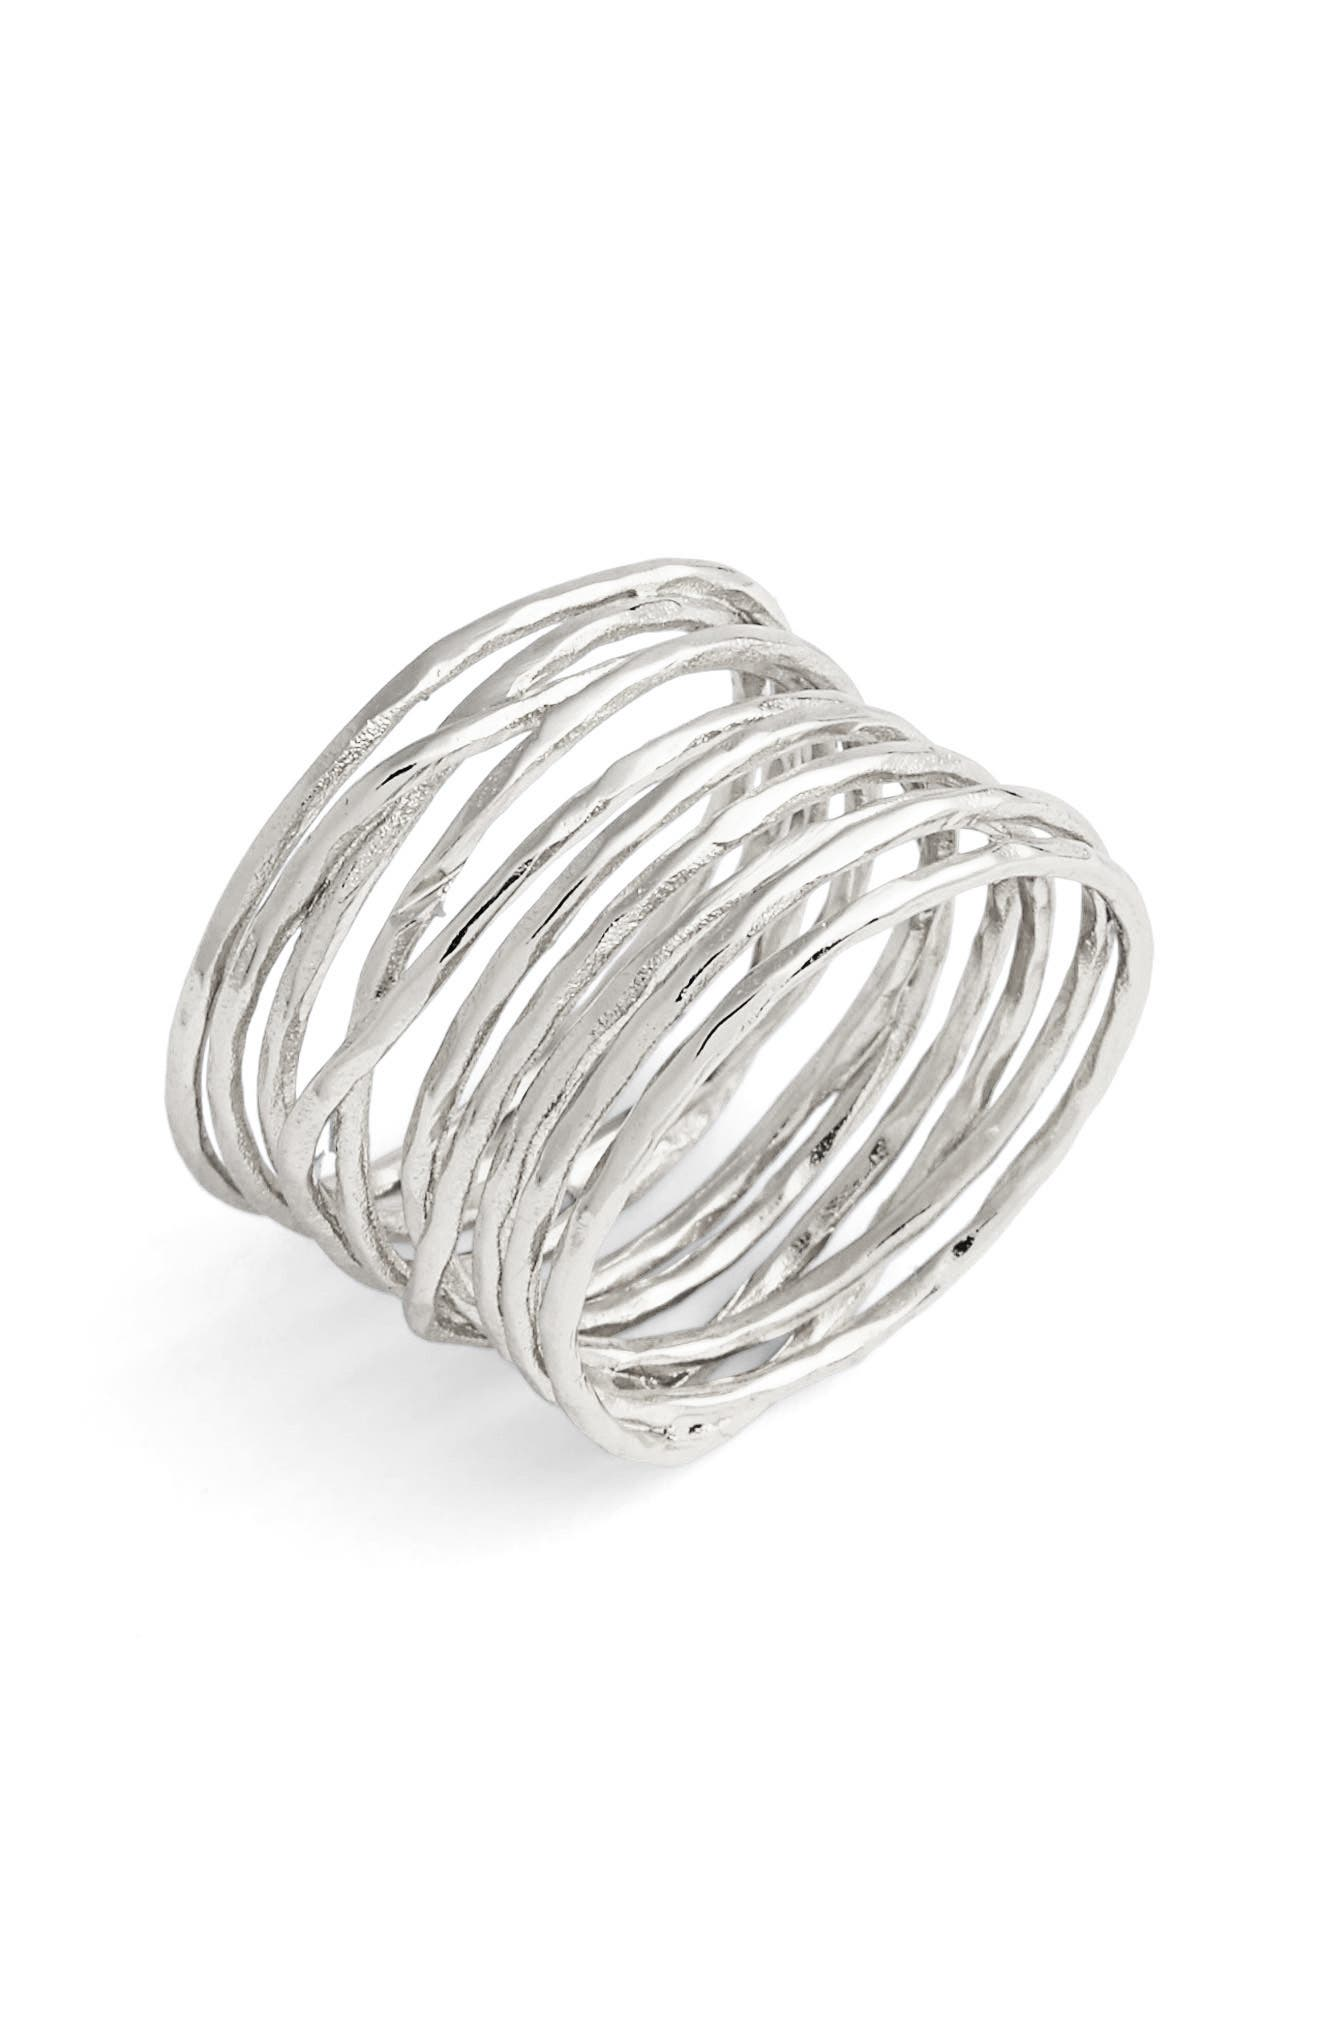 GORJANA 'Lola' Coil Ring, Main, color, SILVER